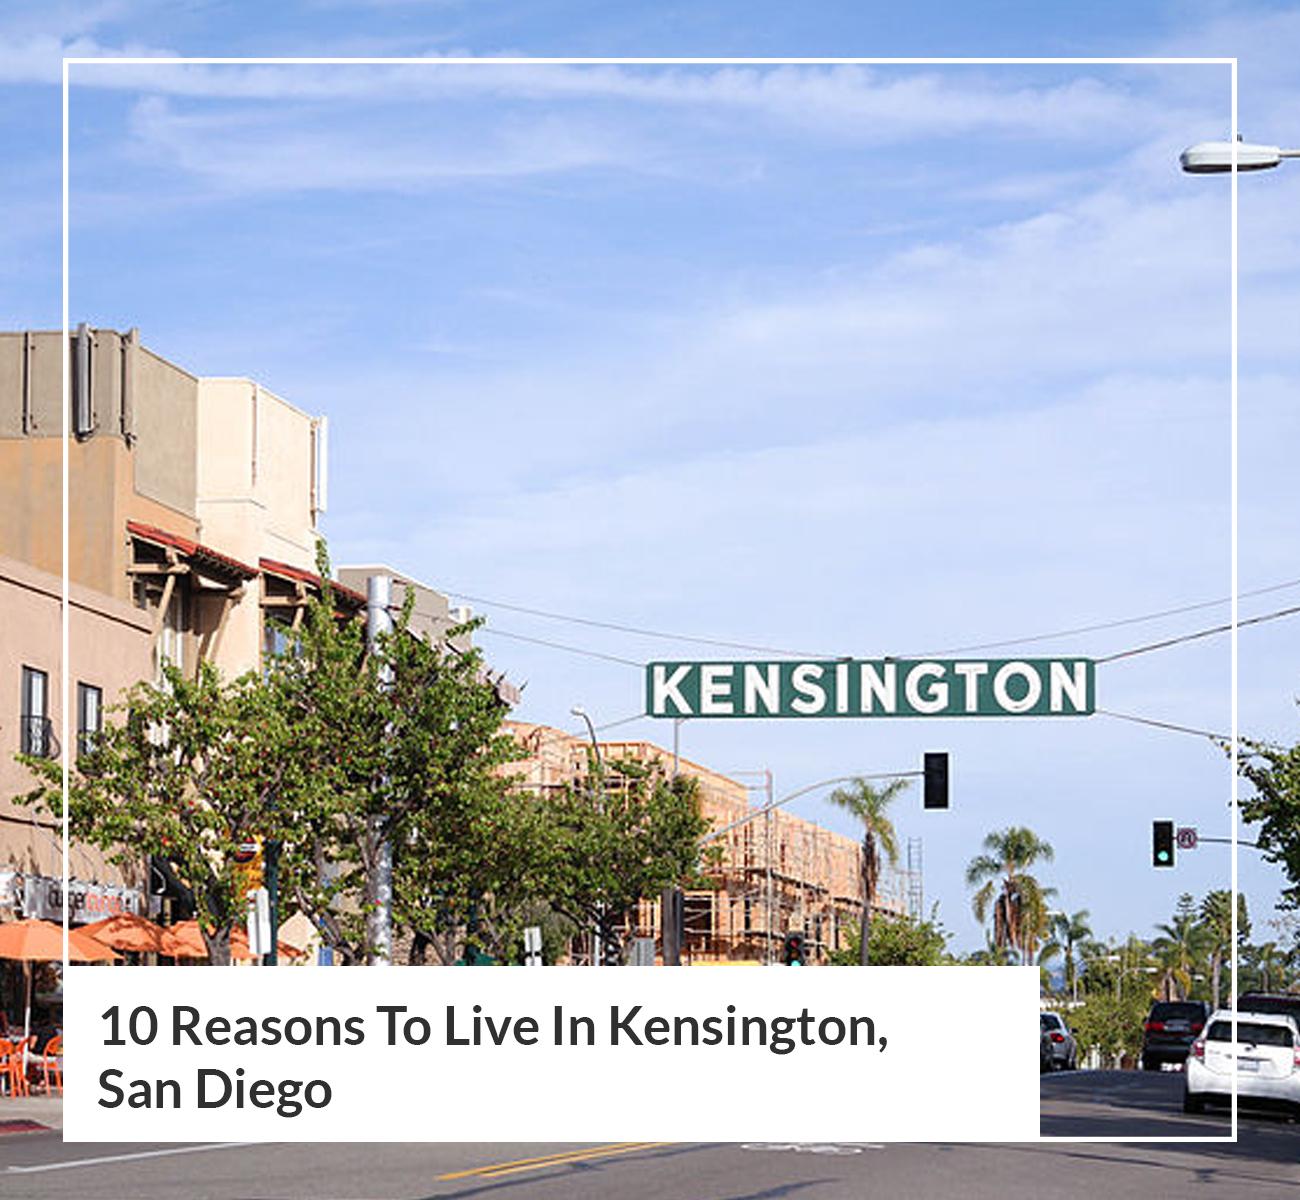 Reasons to Live in Kensington, San Diego